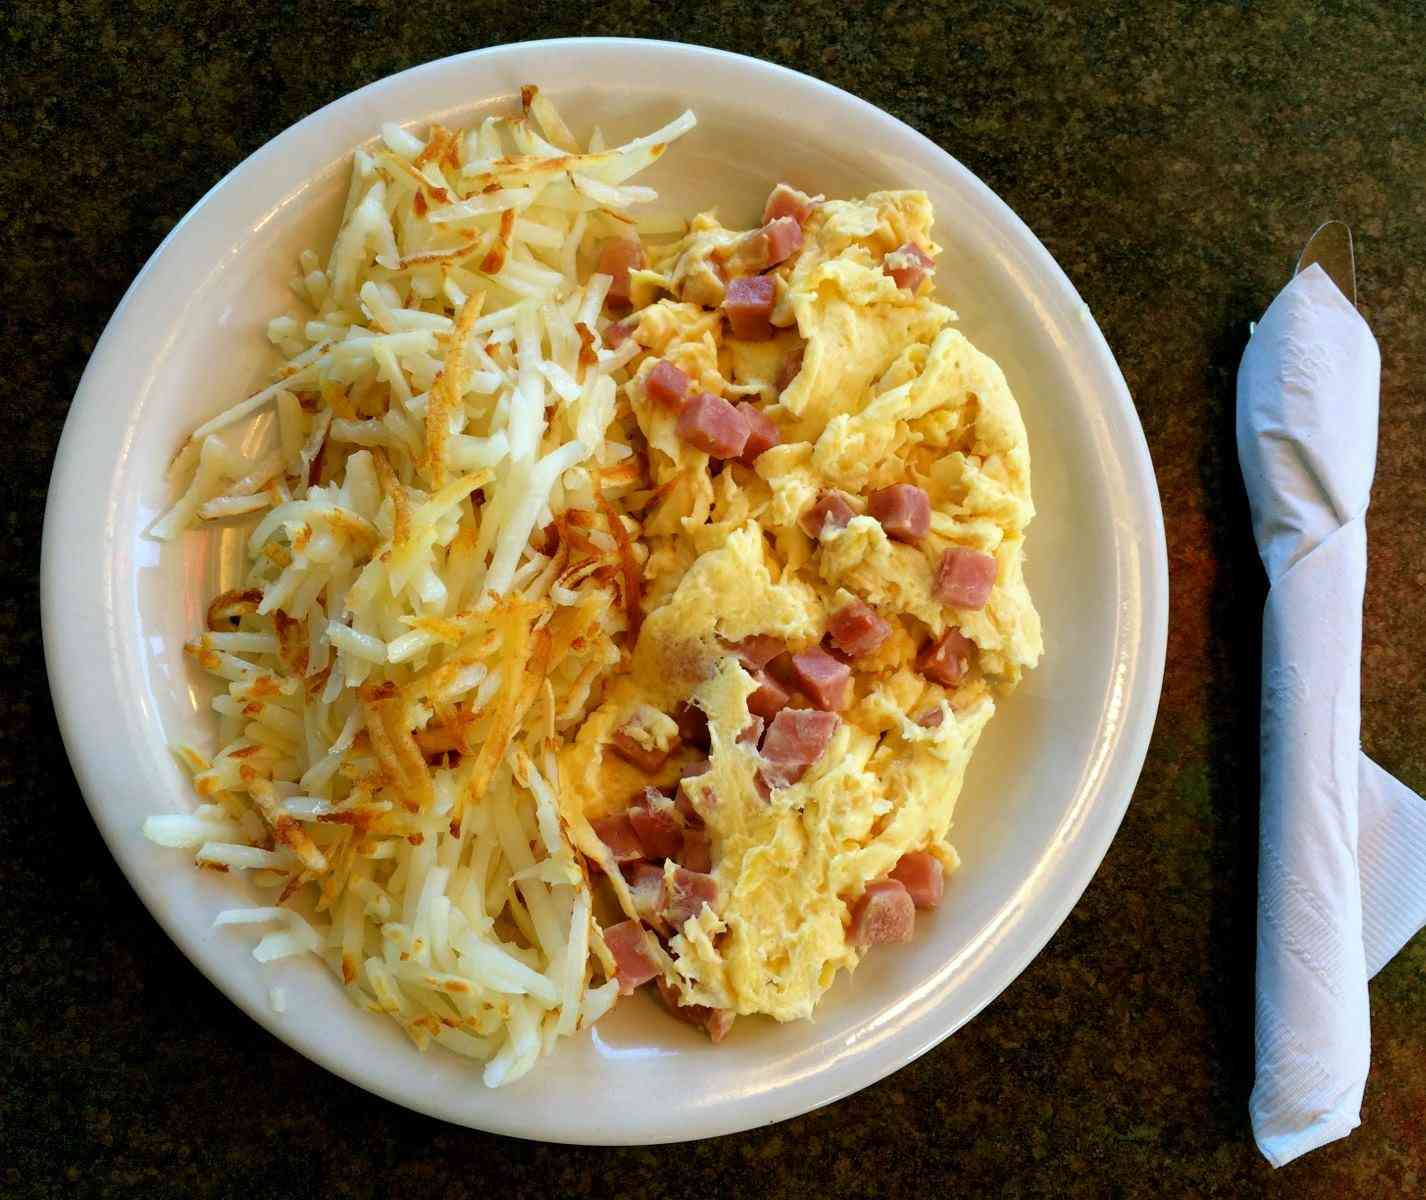 Minced Ham & Egg Scramble